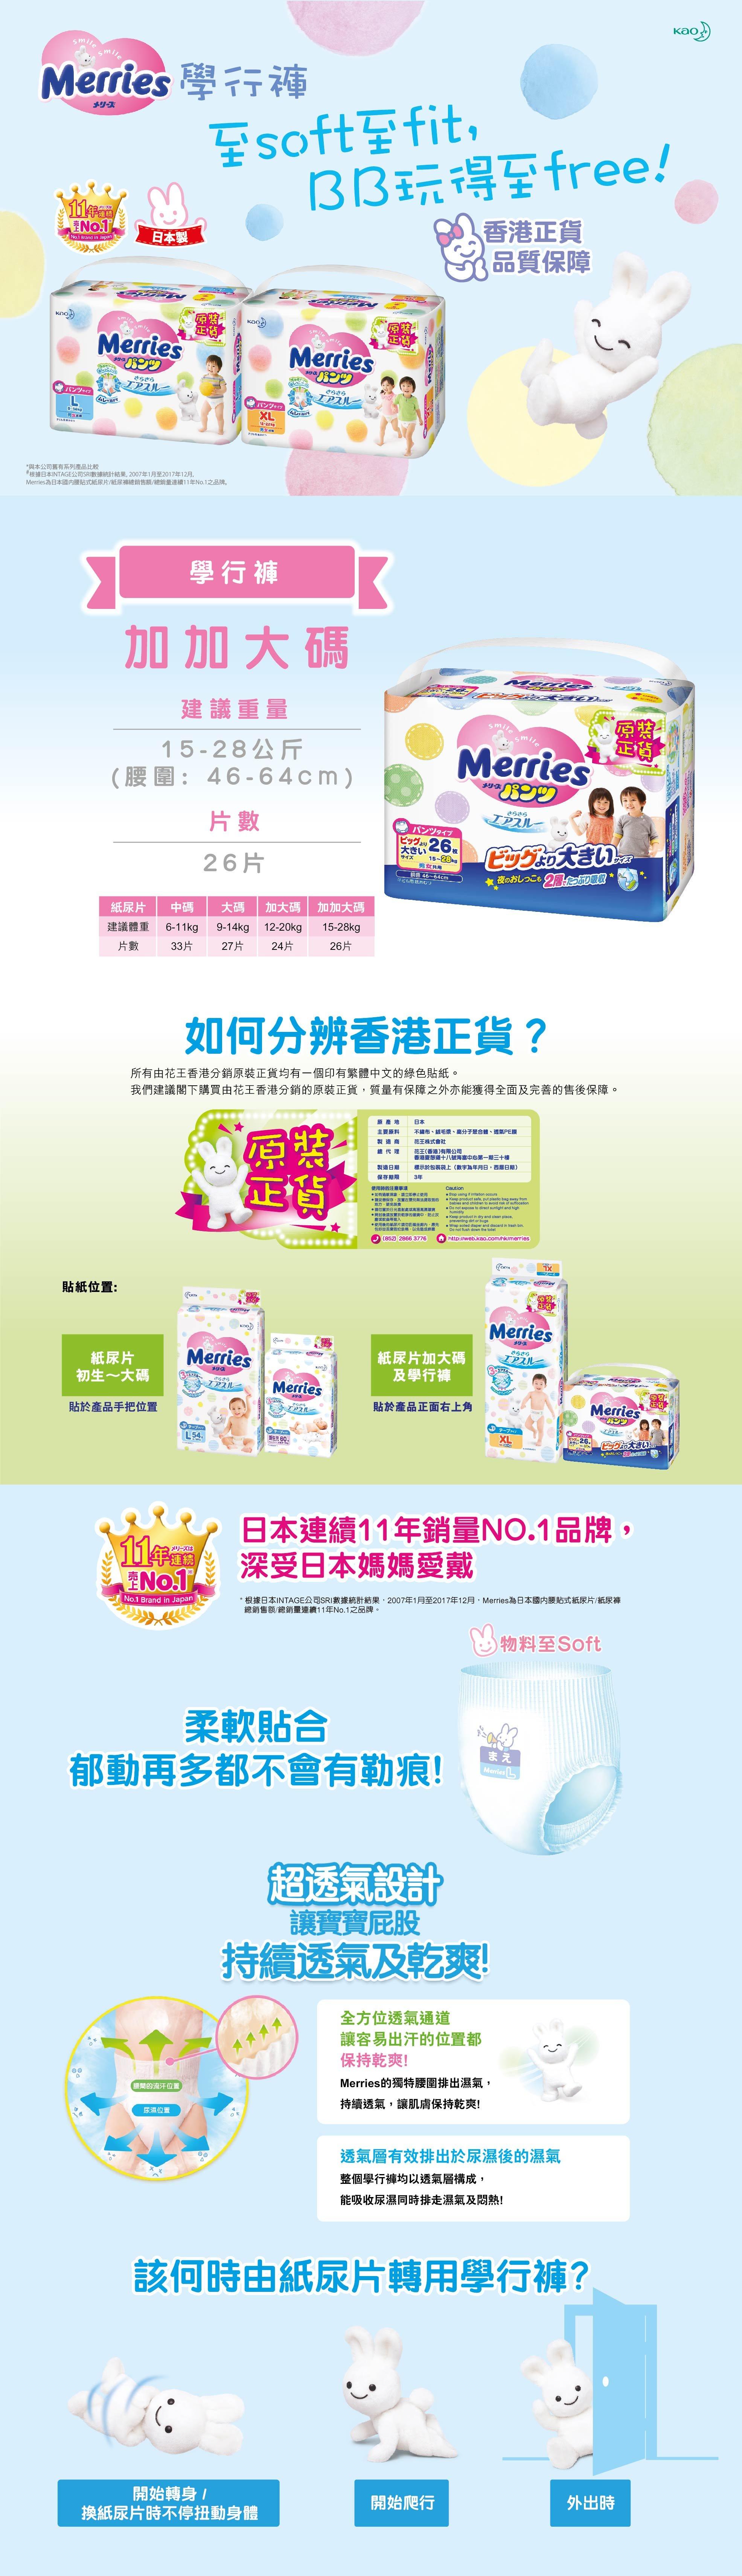 Merries | Pants XXL-26 | HKTVmall Online Shopping